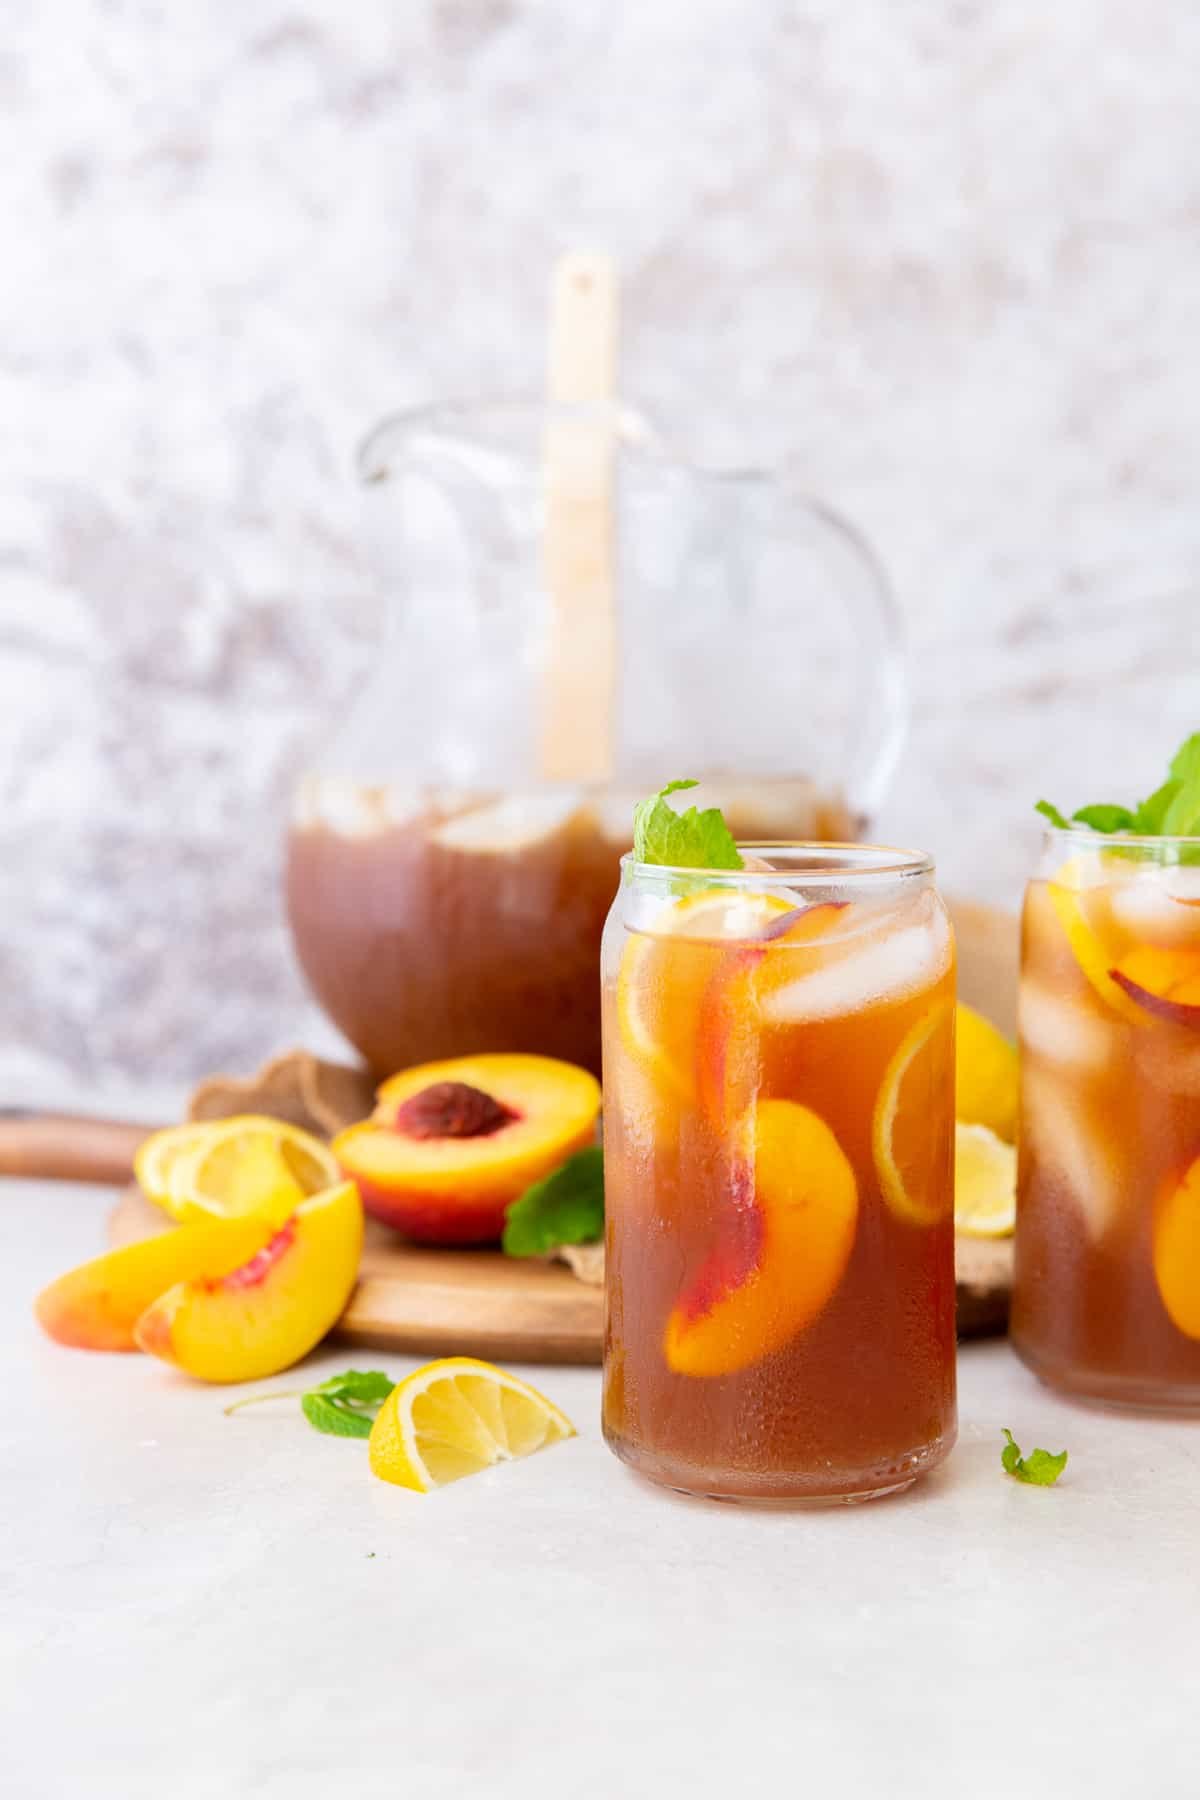 Peach Tea with Pitcher